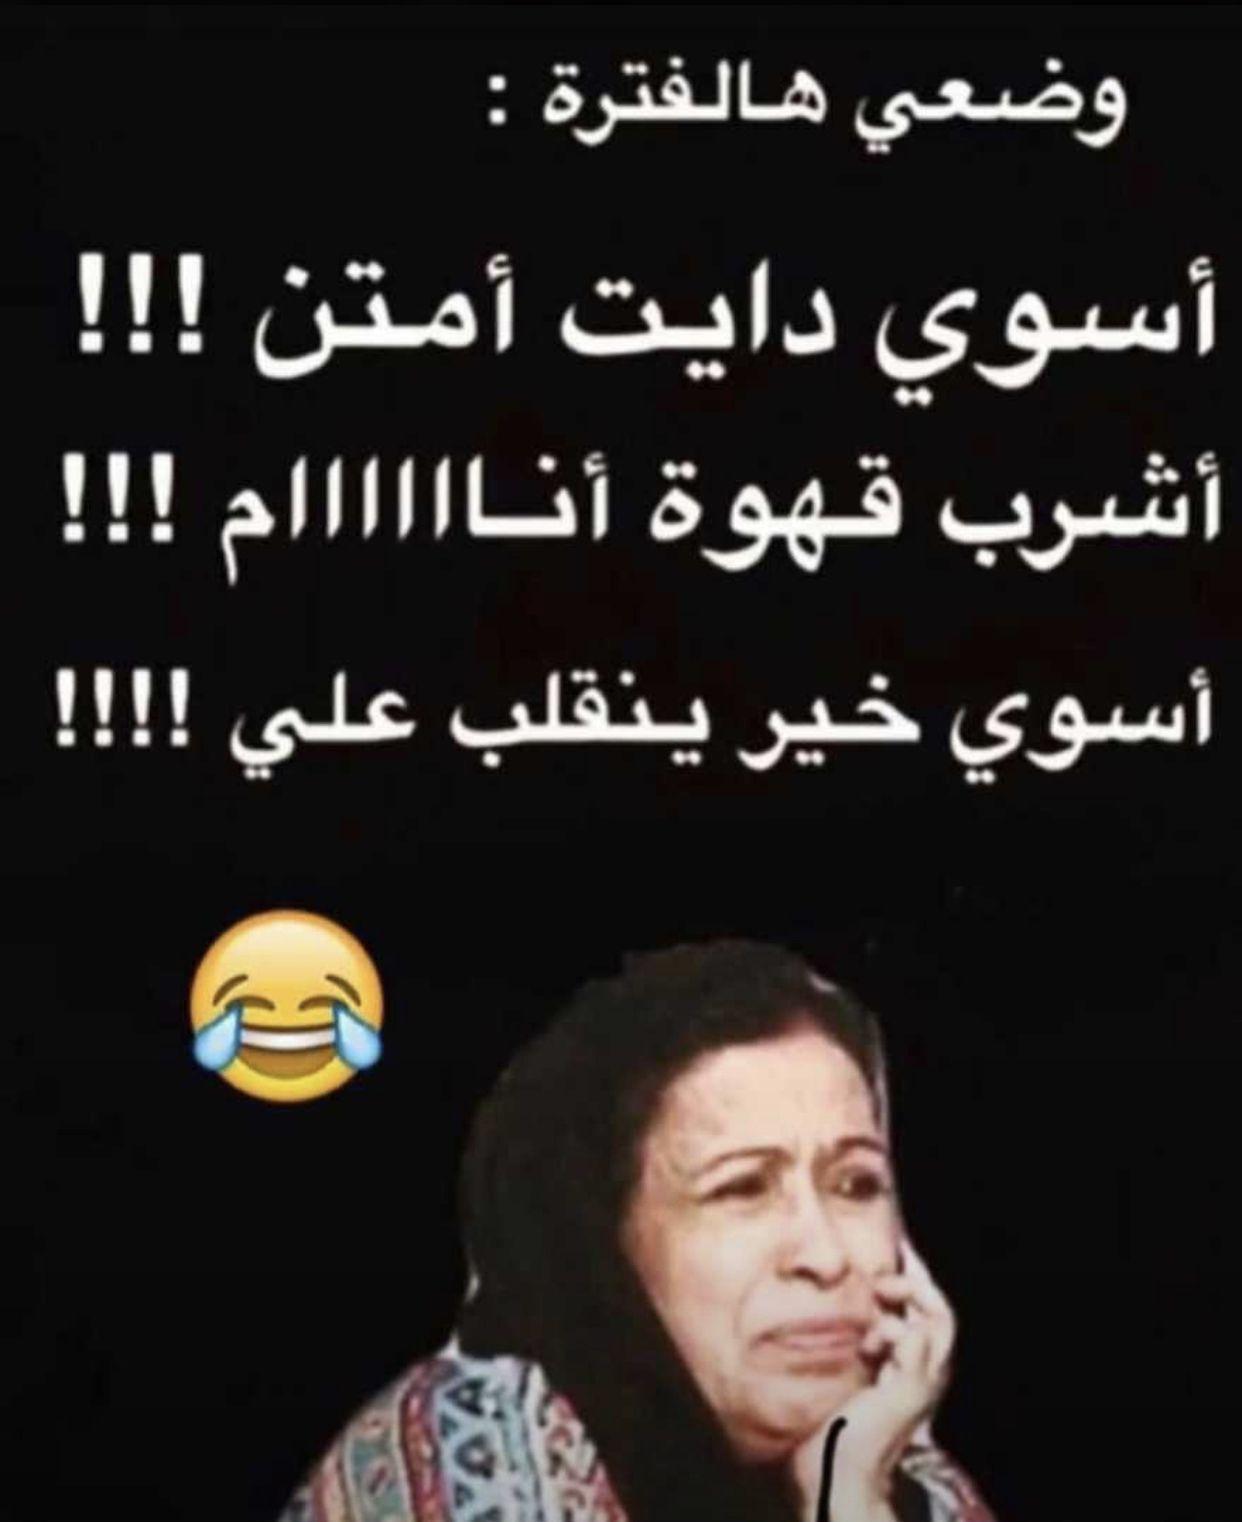 Pin By Sara Art94 On Jokes Funny Quotes Funny Arabic Quotes Jokes